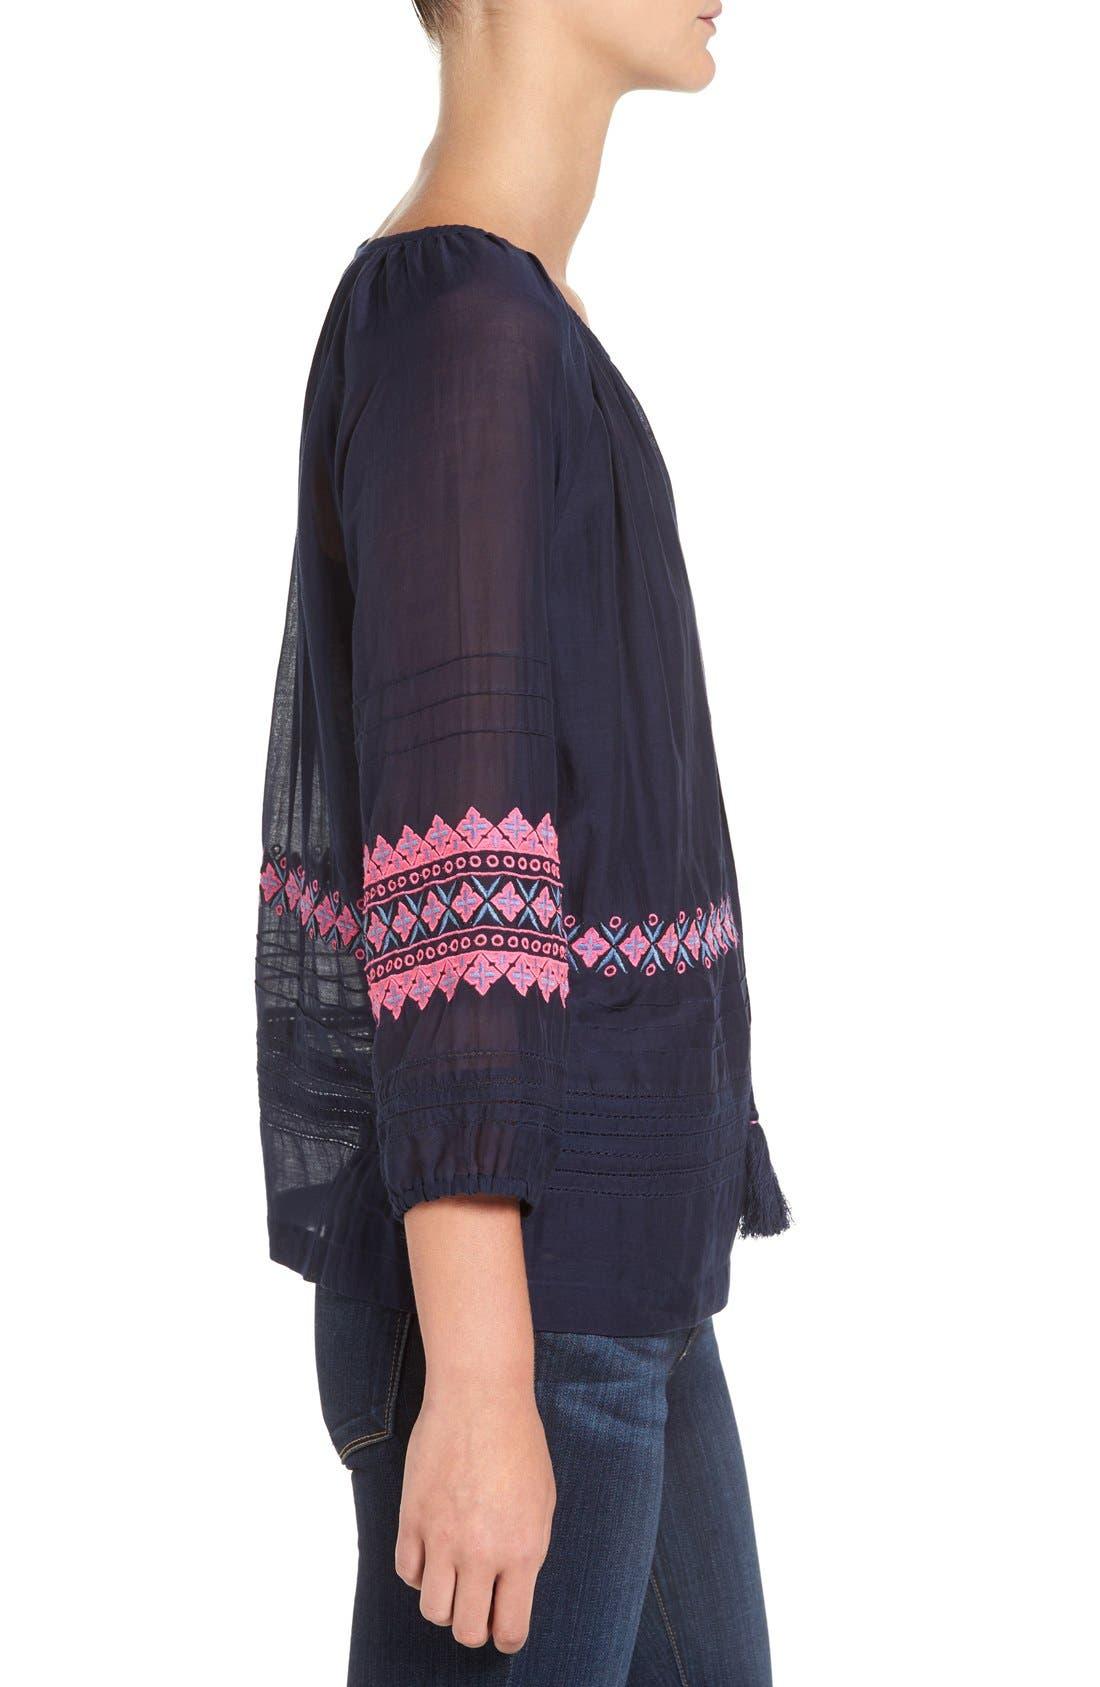 Alternate Image 3  - Vineyard Vines Embroidered Cotton & Silk Peasant Top